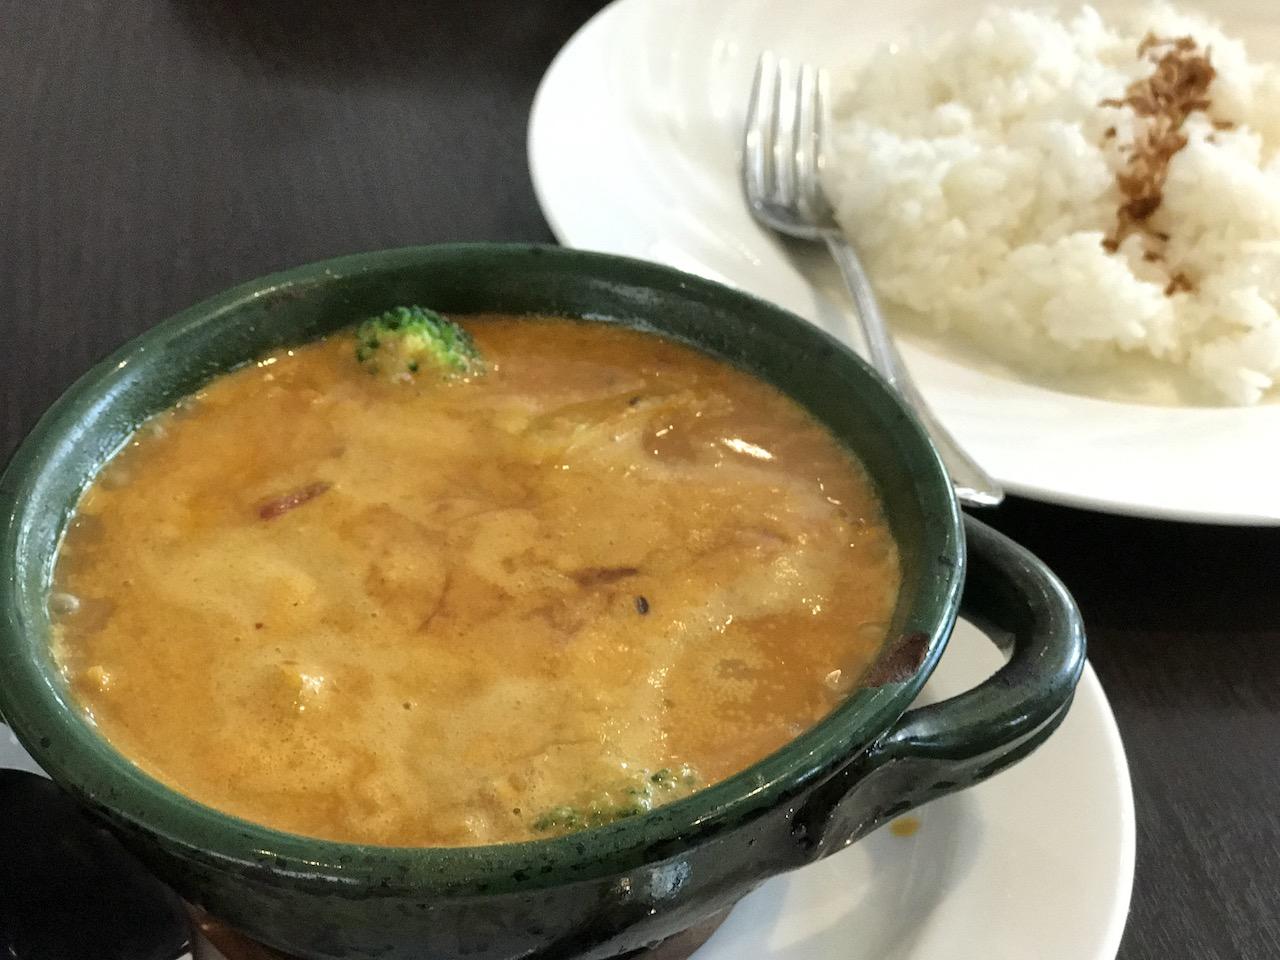 【JALシティ羽田・はるほろ@穴守稲荷】限定スープカレーが絶品!